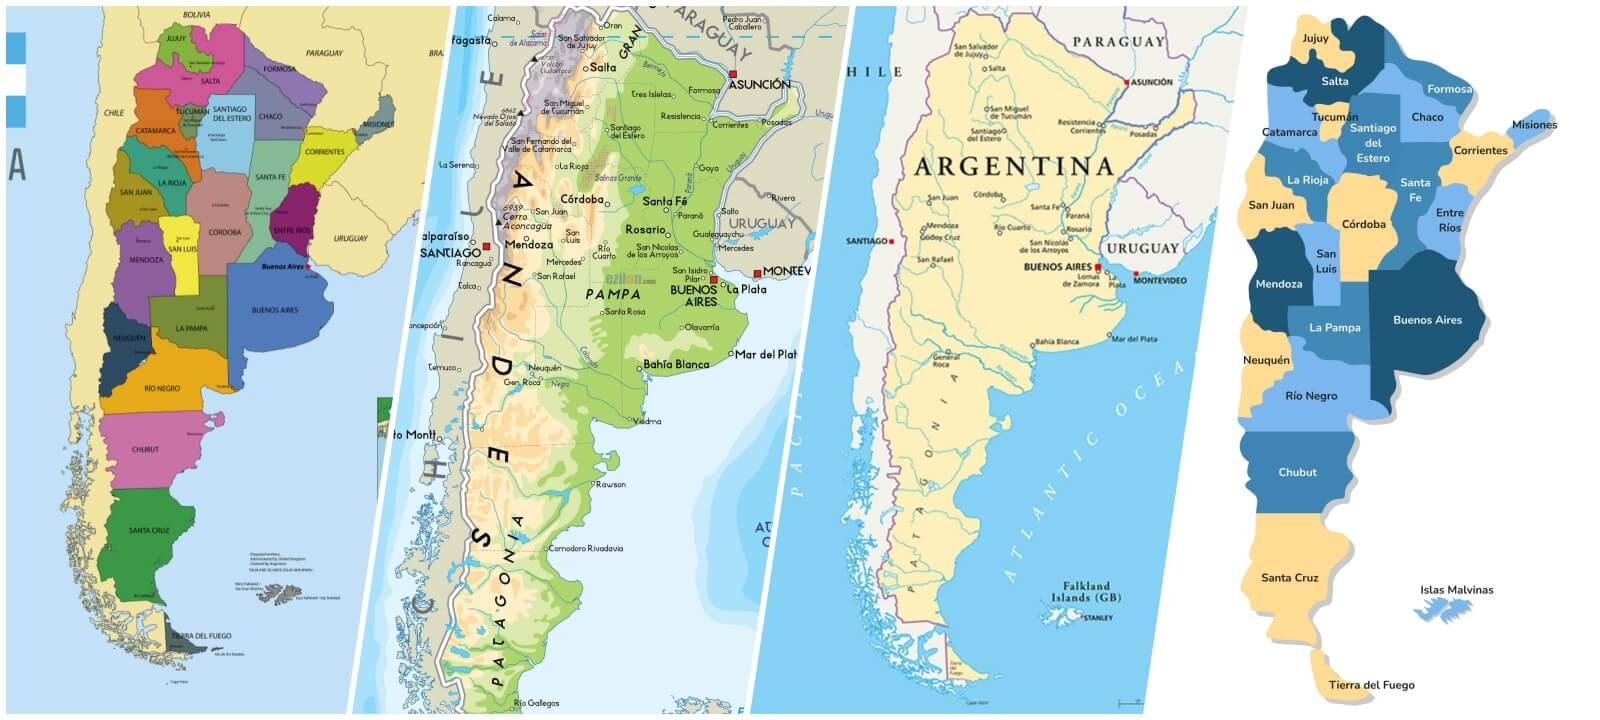 mapa de argentina para descargar